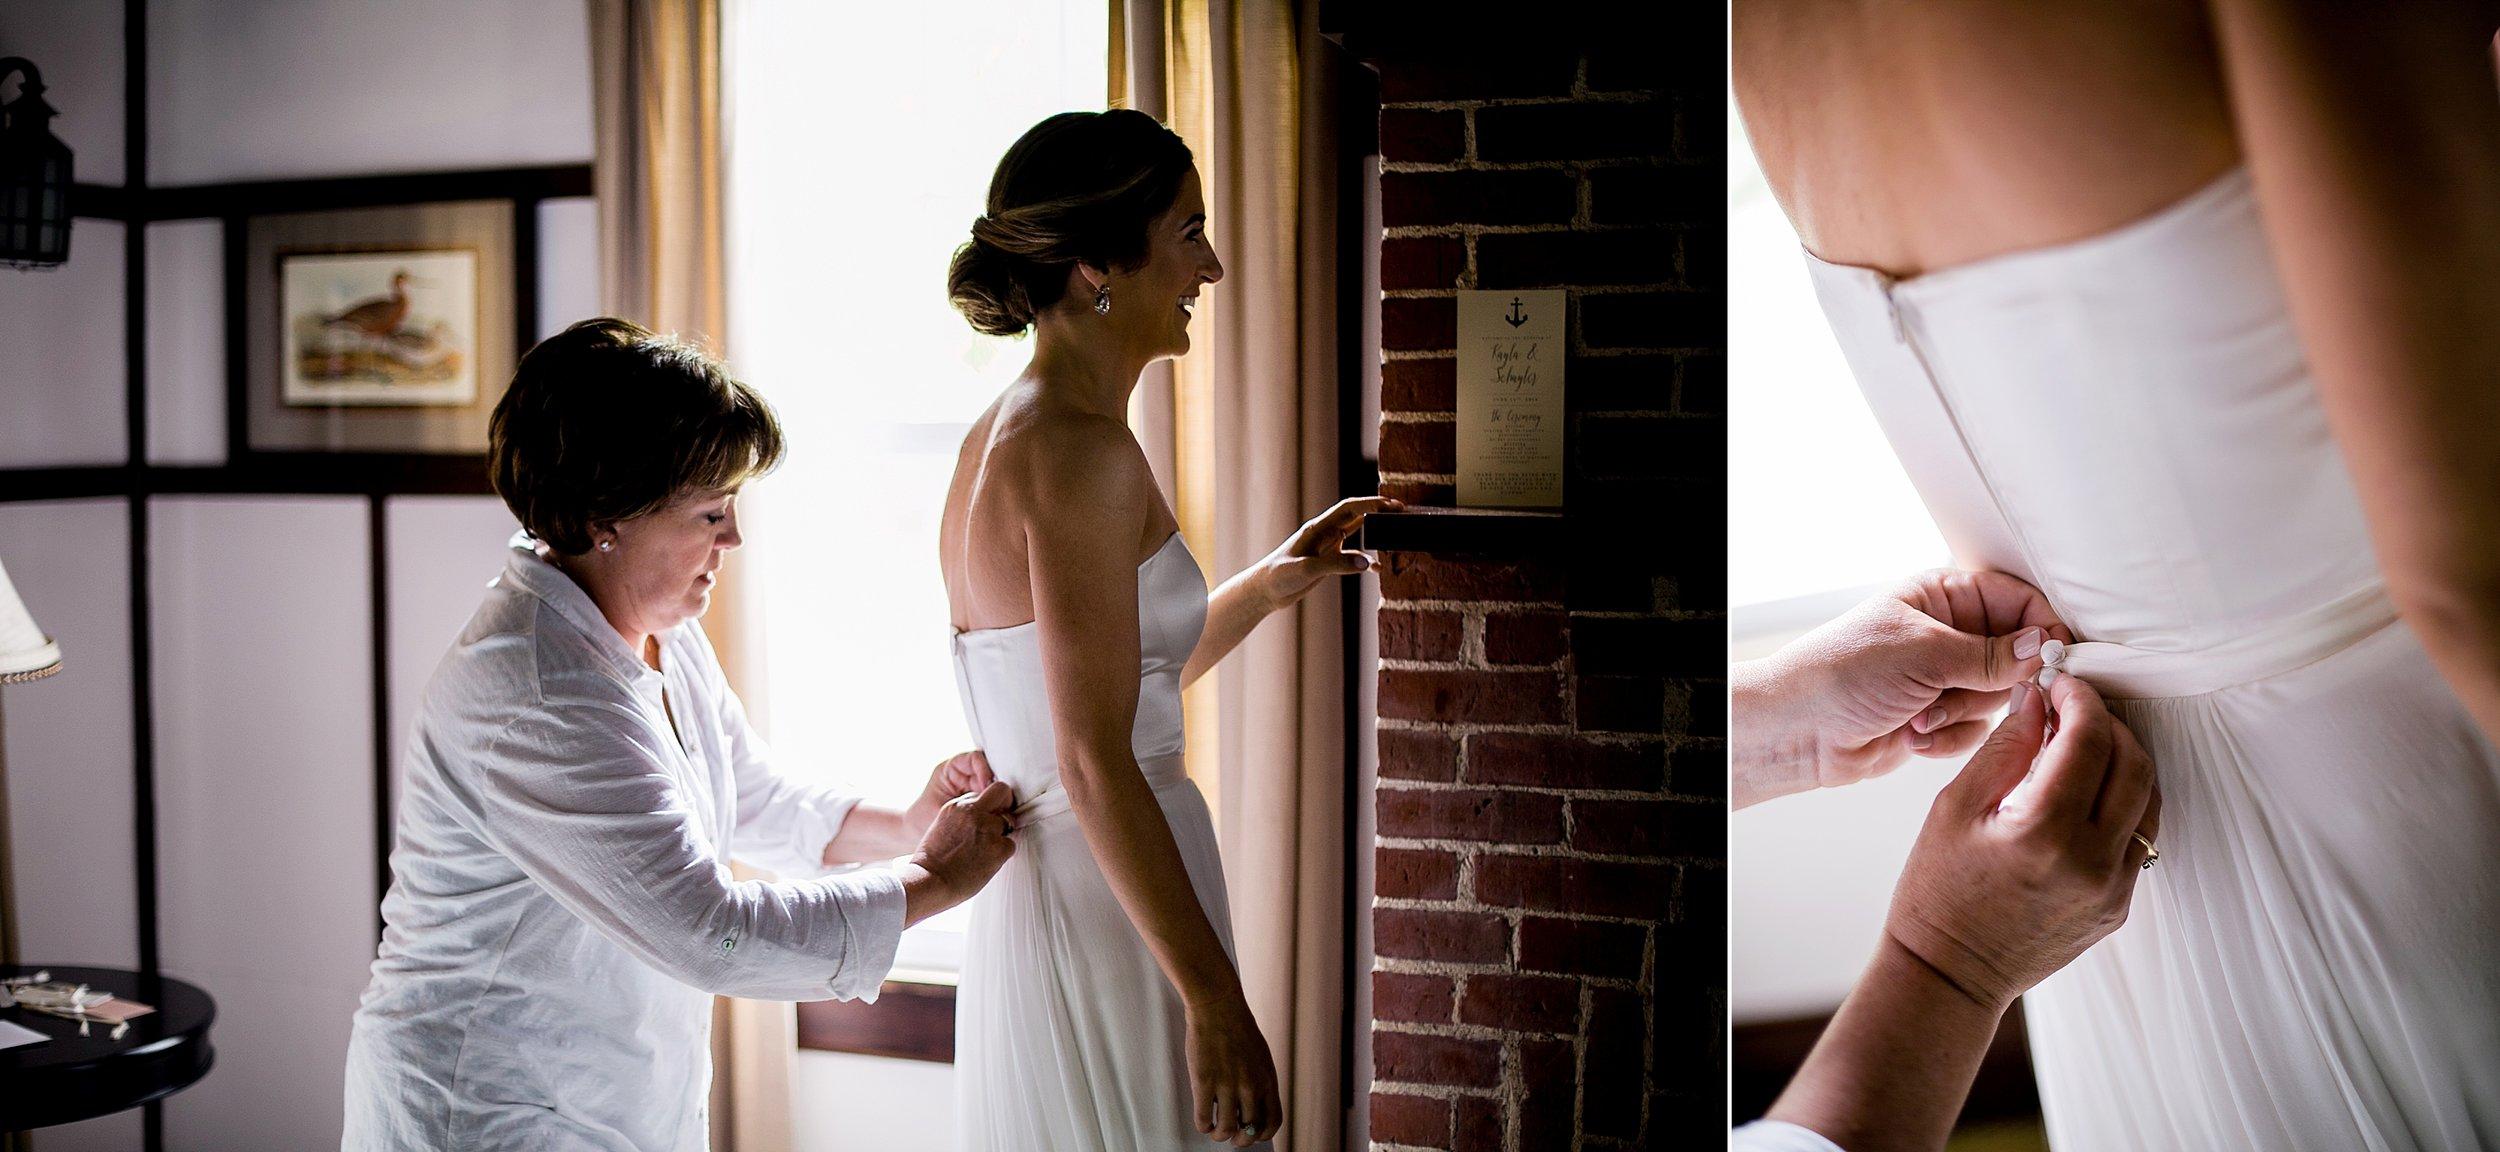 009 los angeles wedding photographer todd danforth photography cape cod.jpg